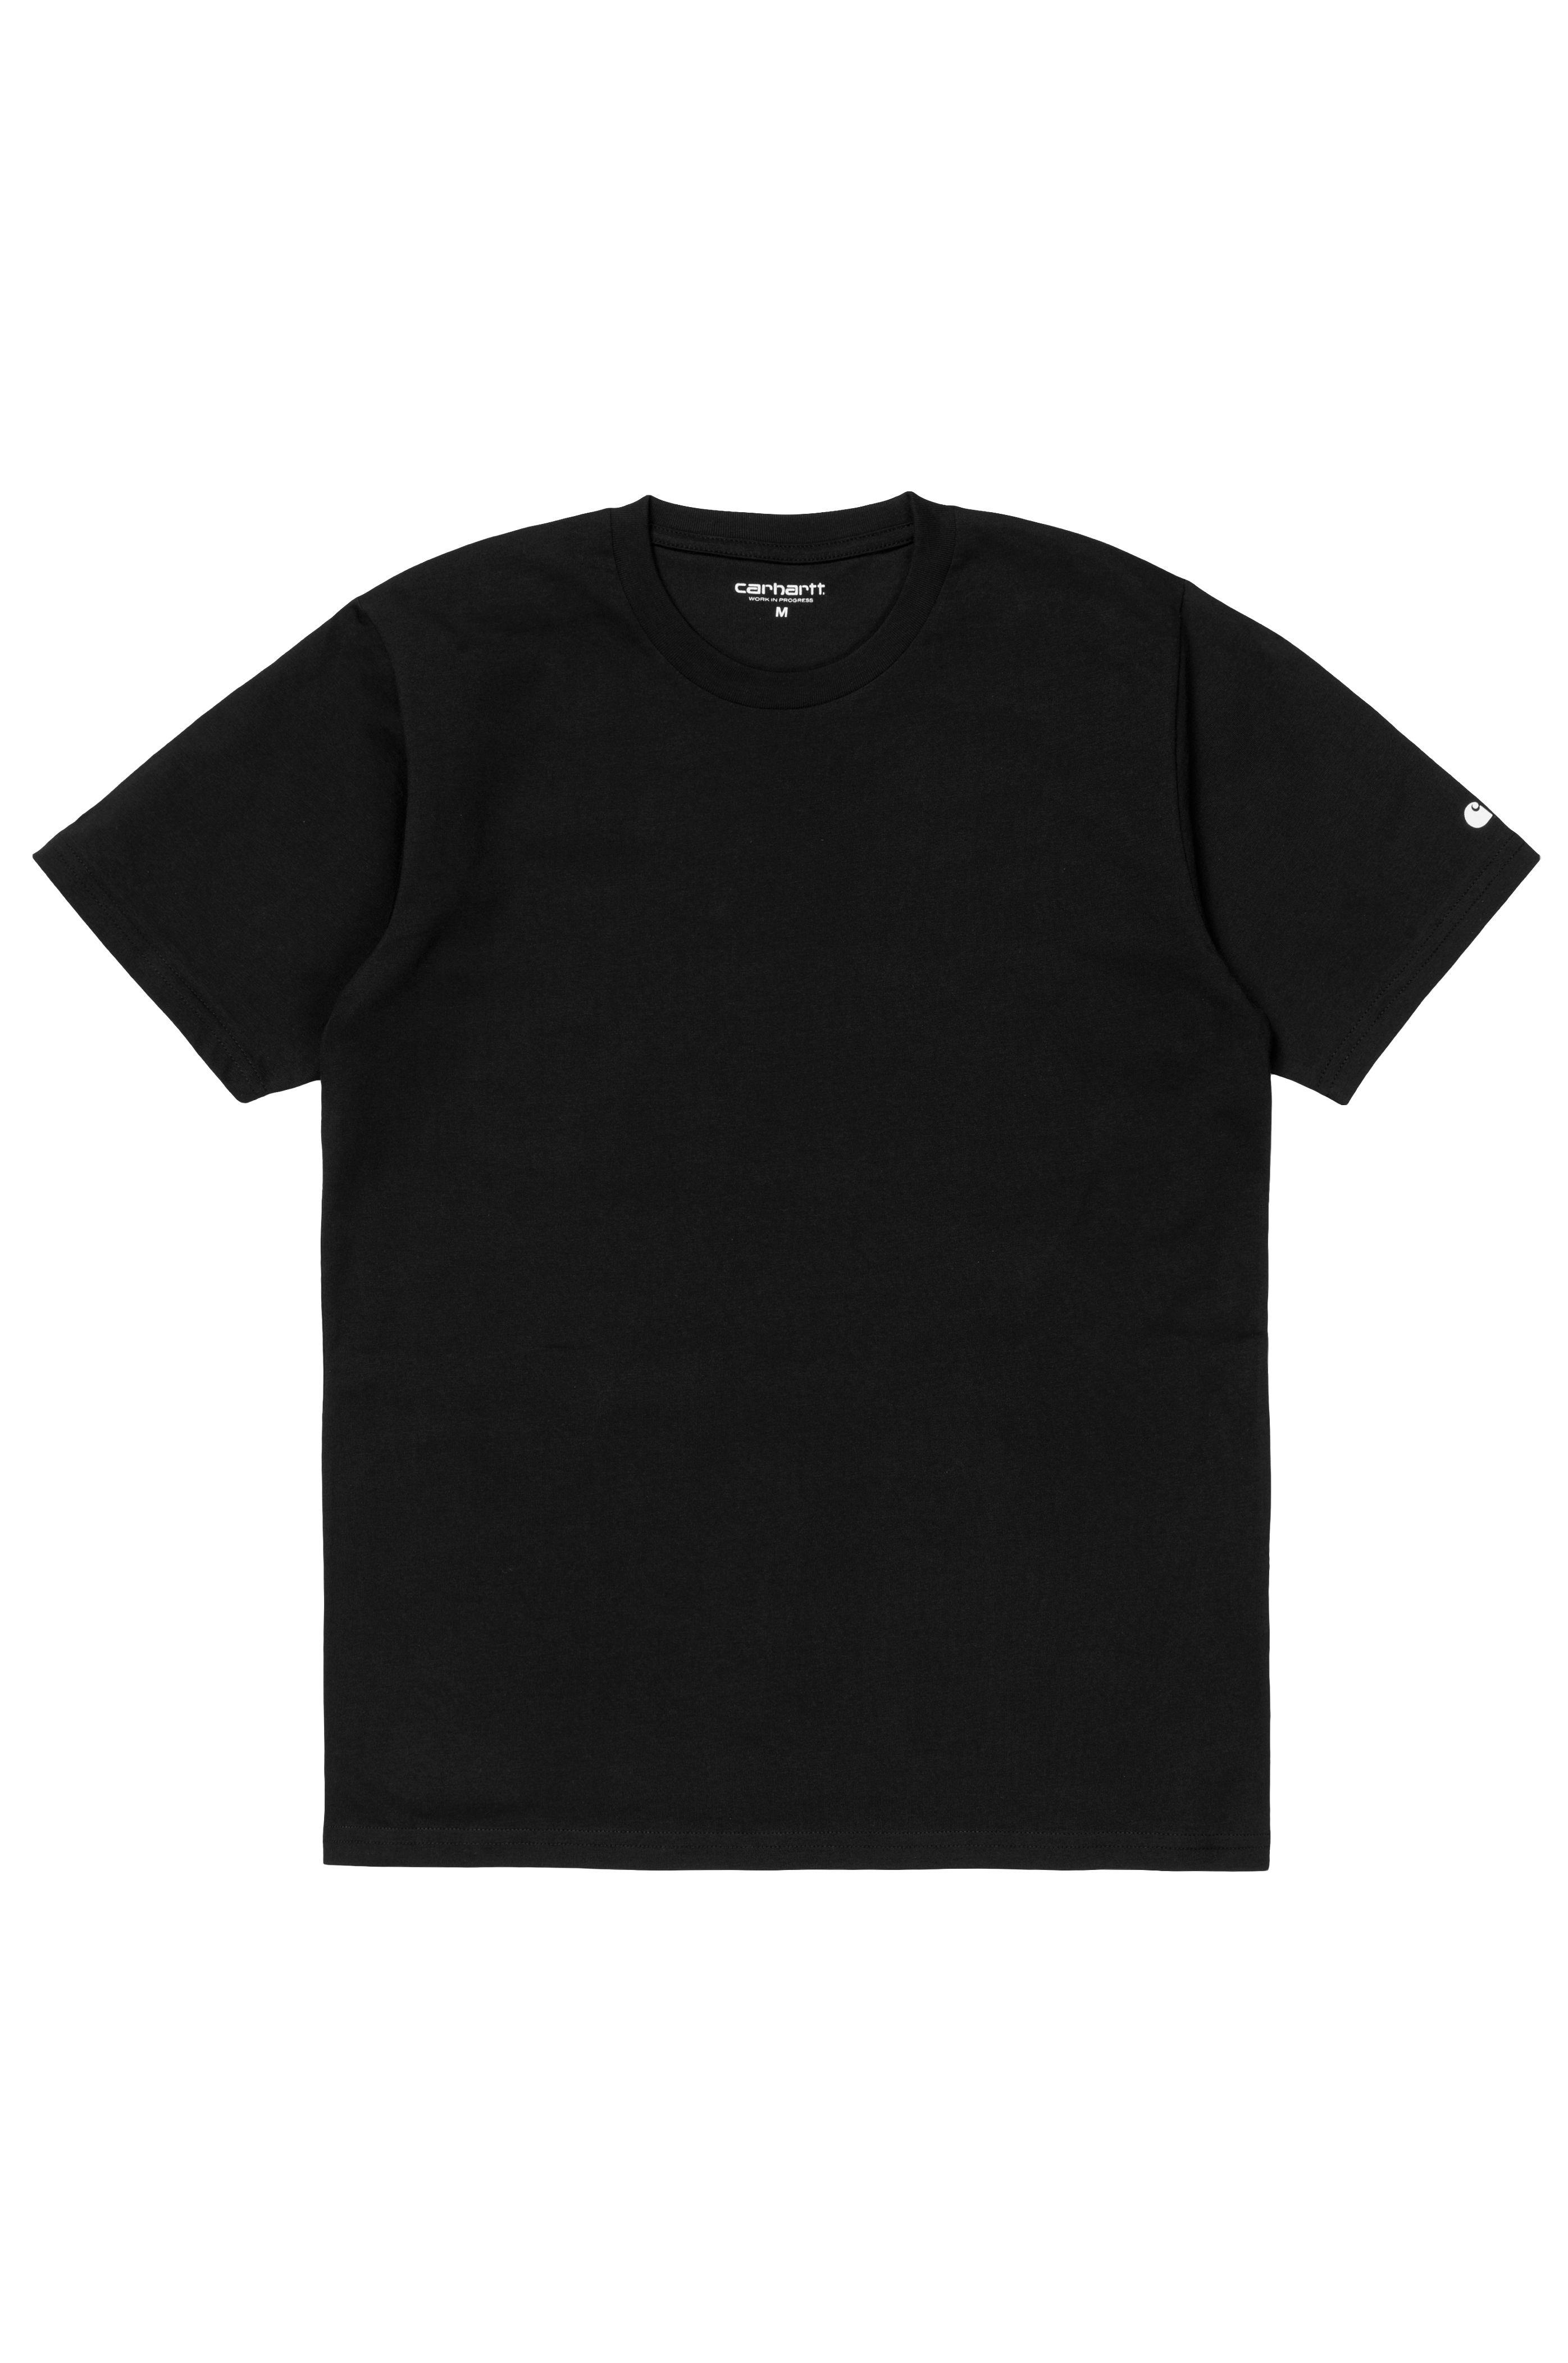 T-Shirt Carhartt WIP BASE Black/White